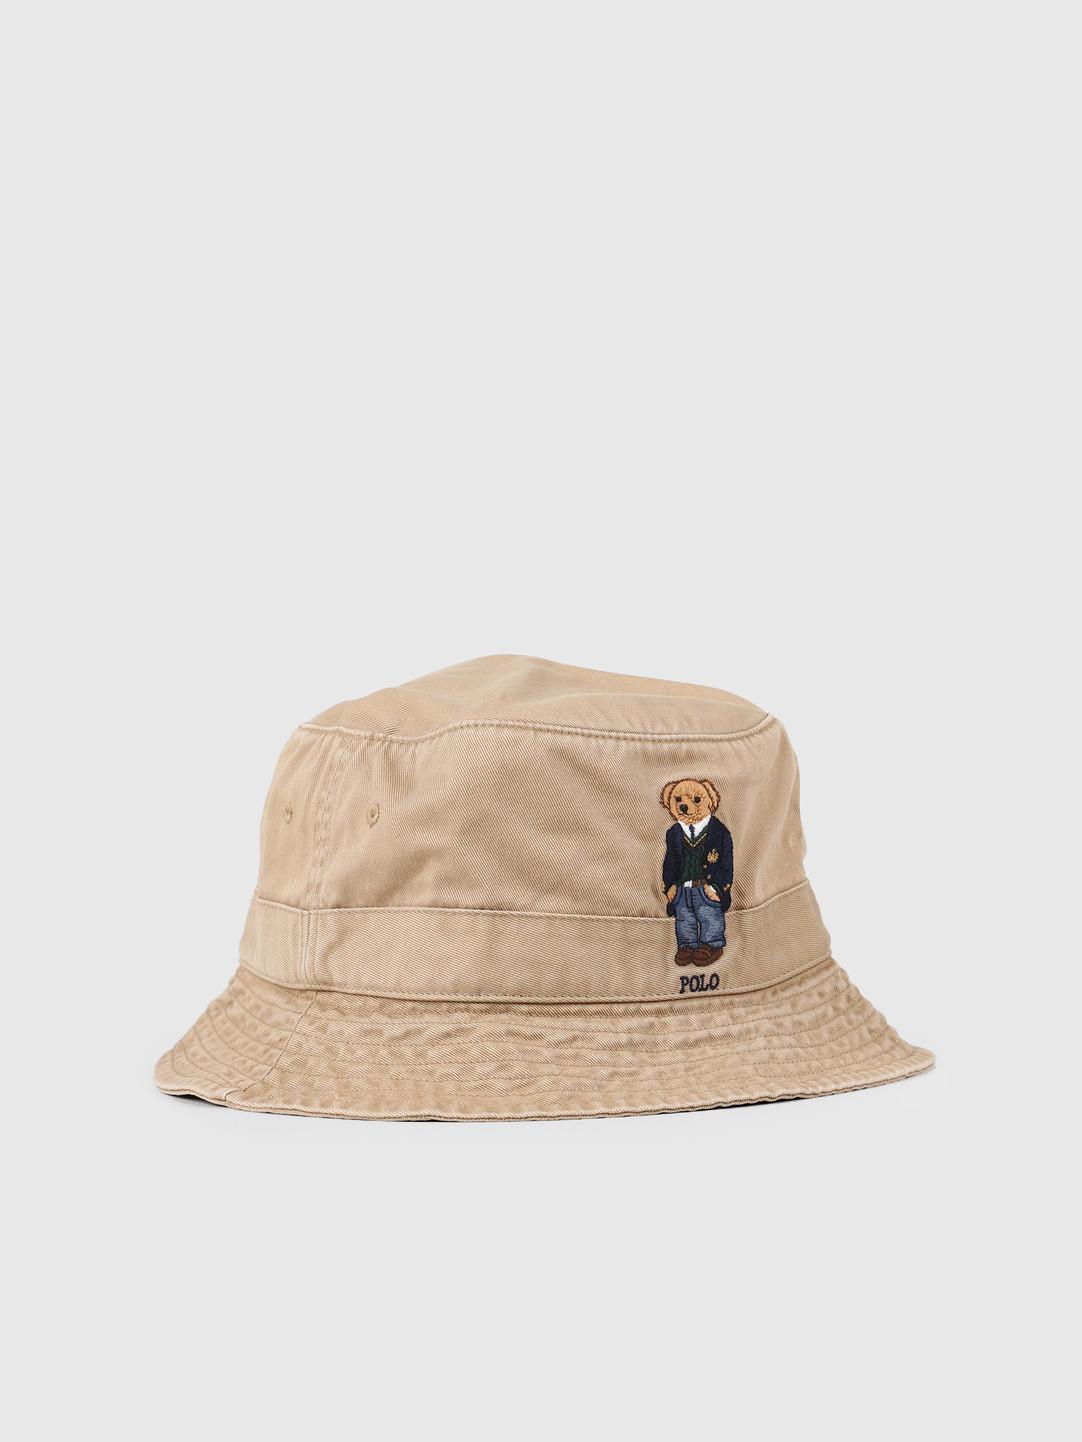 Bear Hat Khaki Polo Bucket Loft 710765087001 Beige Ralph Lauren SVMGLpqUz